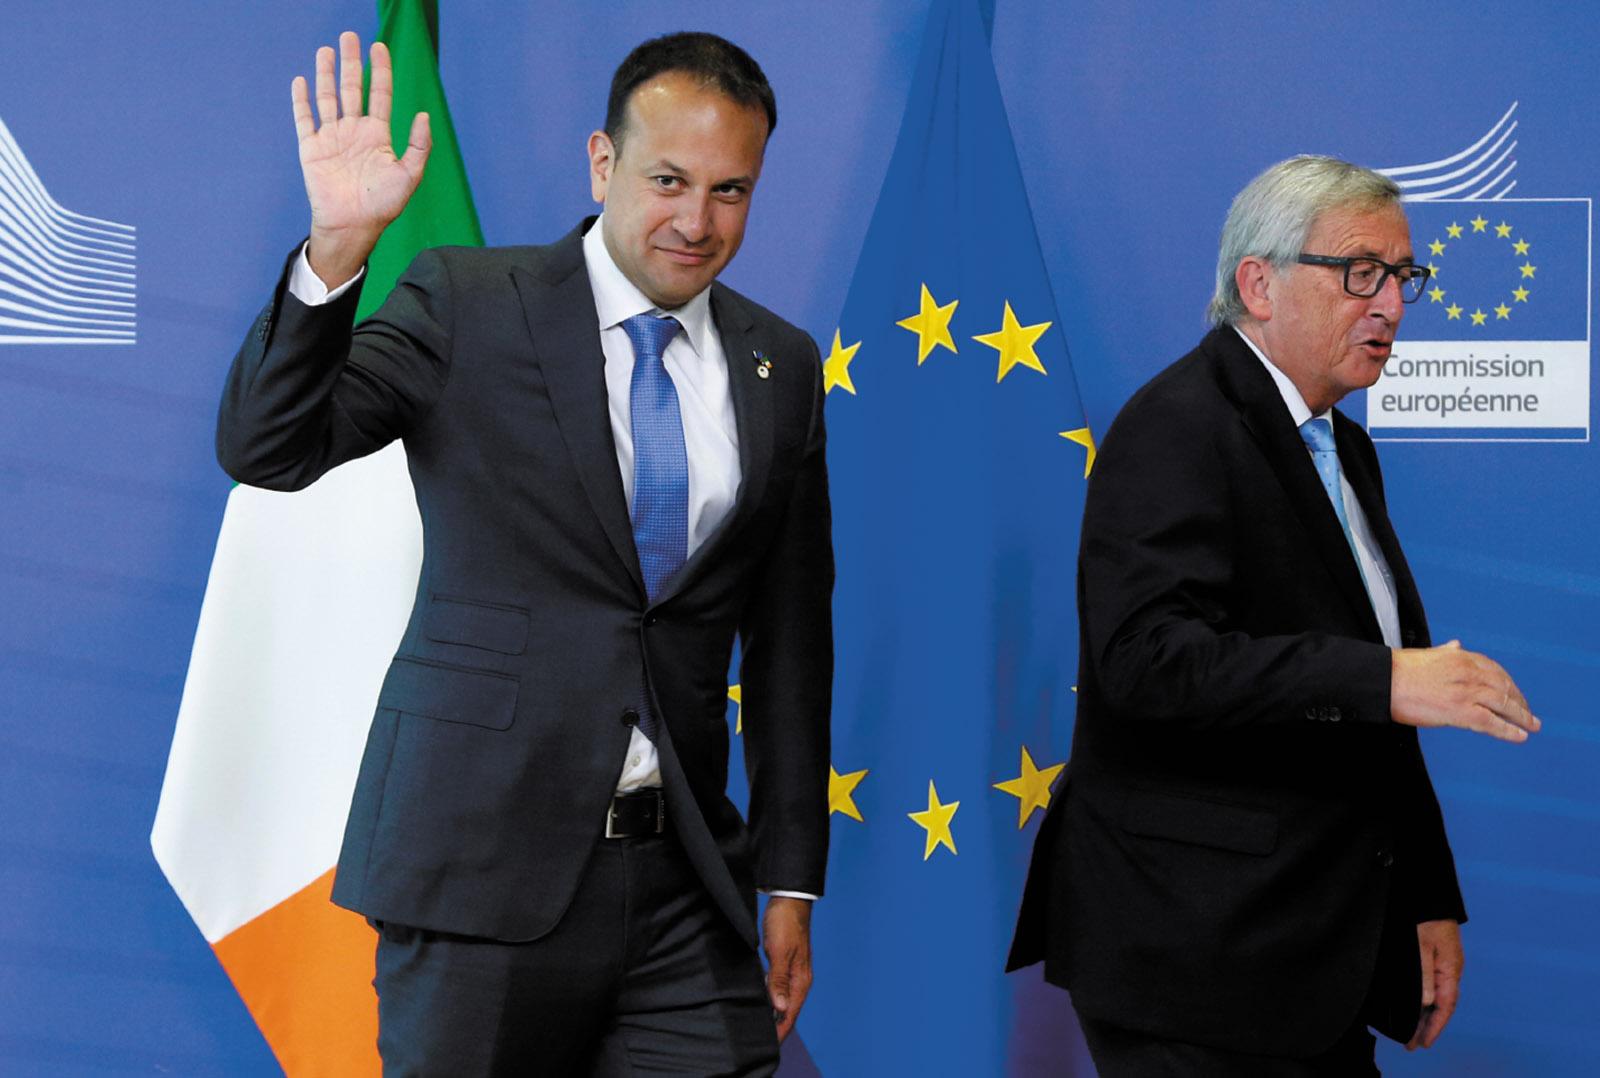 Irish Prime Minister Leo Varadkar and European Commission President Jean-Claude Juncker at a summit of the EU, Brussels, June 2017